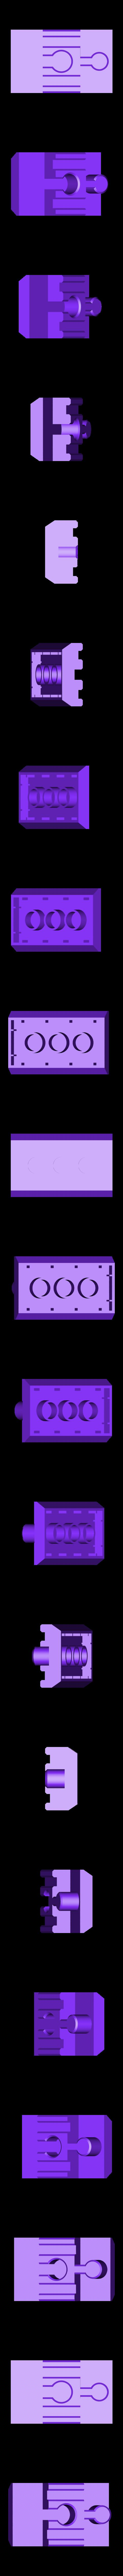 duplo_to_brio_2x4_rmx.stl Download free STL file Duplo To Brio Converter Brick - rmx • 3D print template, MixedGears